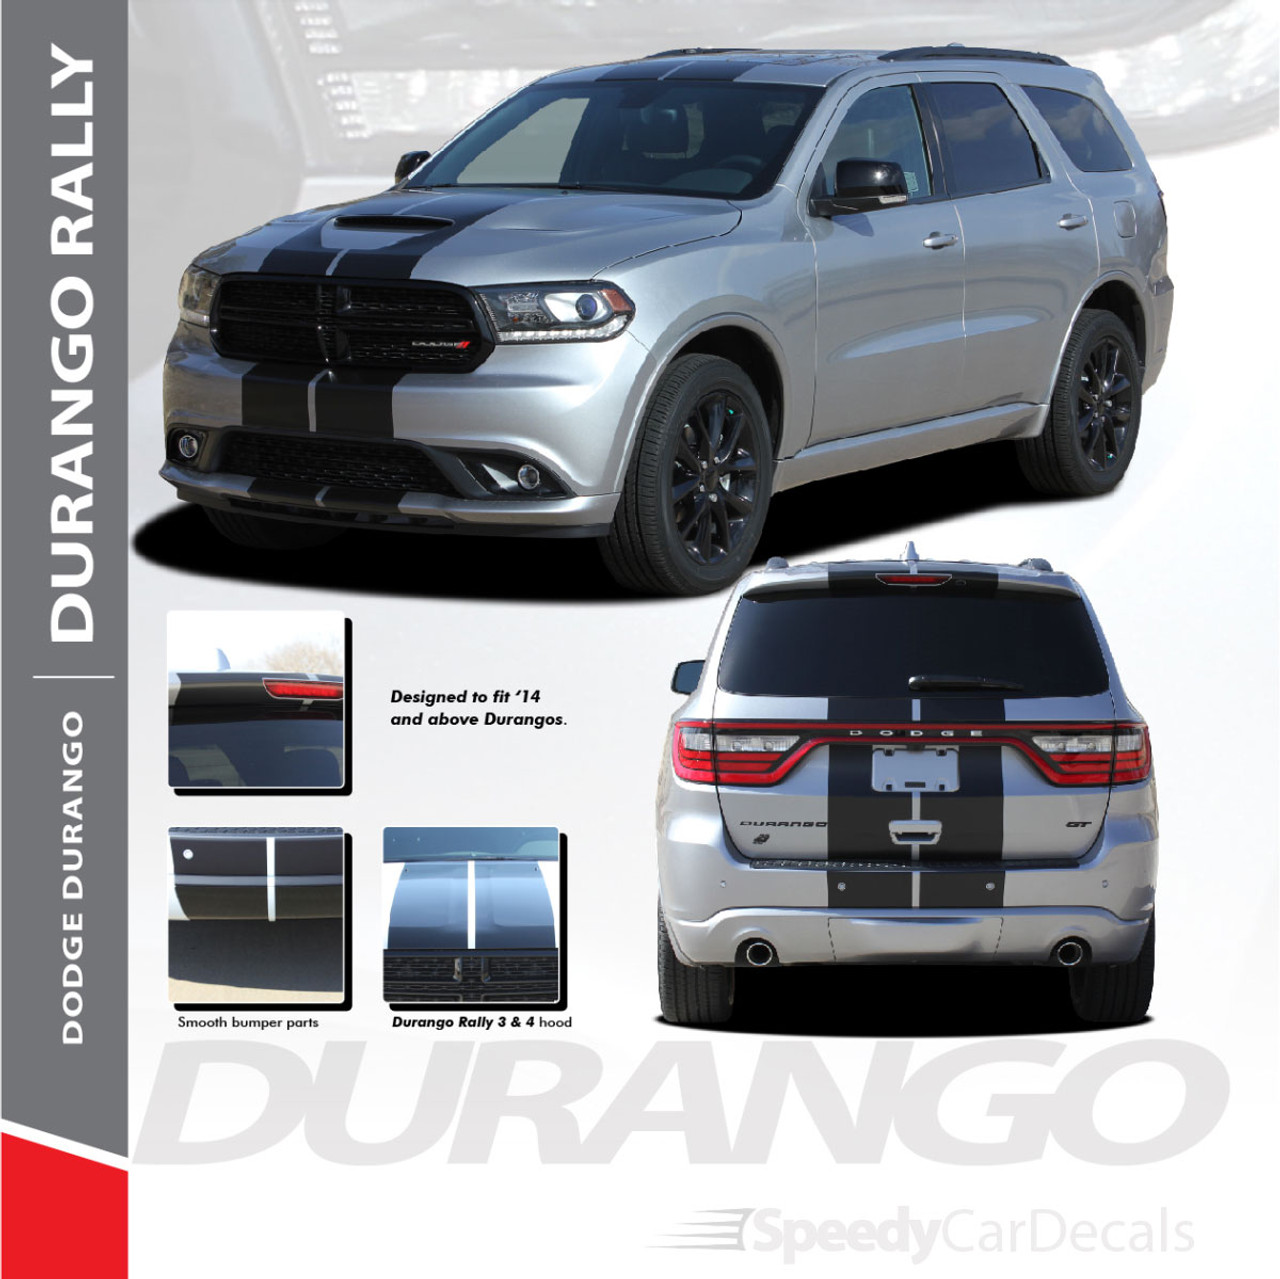 Dodge Durango Racing Stripes 3m Durango Rally 2014 2018 2019 2020 2021 Premium And Supreme Install Speedycardecals Fast Car Decals Auto Decals Auto Stripes Vehicle Specific Graphics